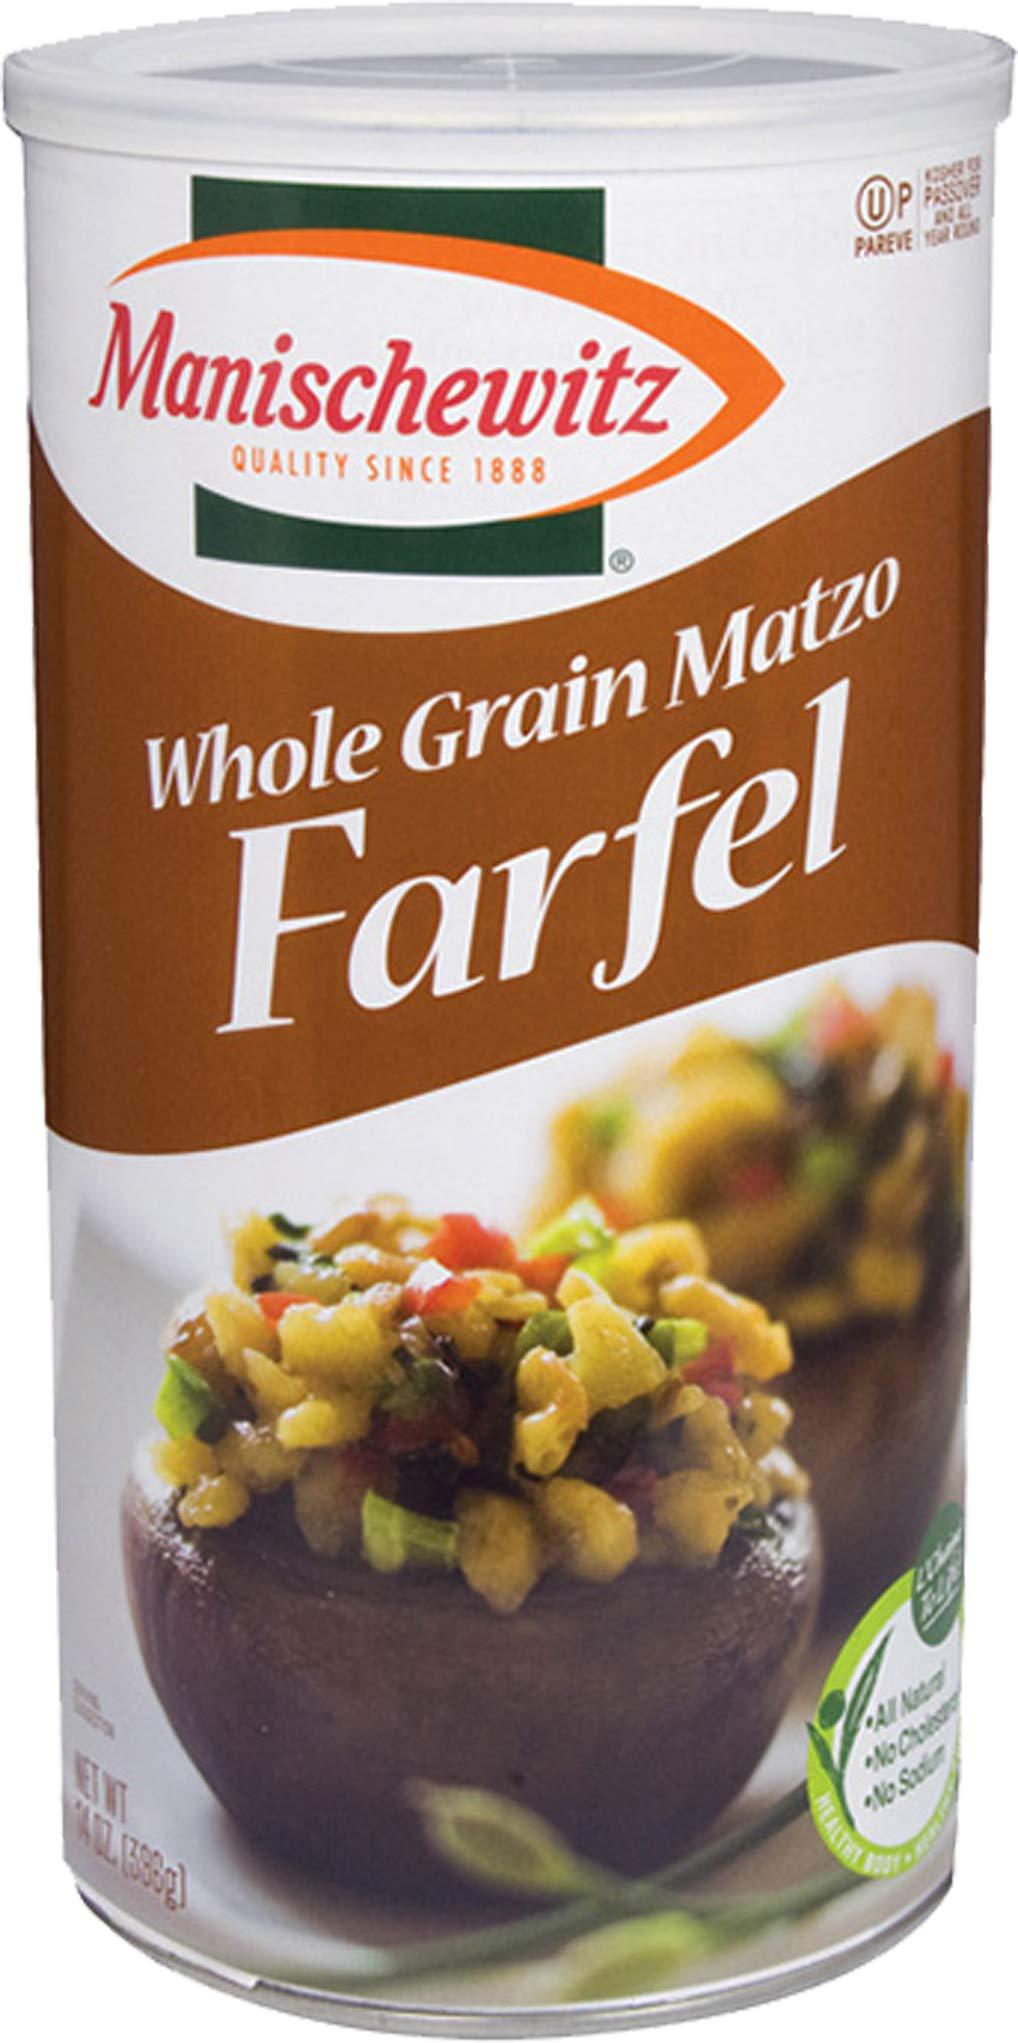 MANISCHEWITZ Whole Grain Fargel Matzo Canister, 14 OZ